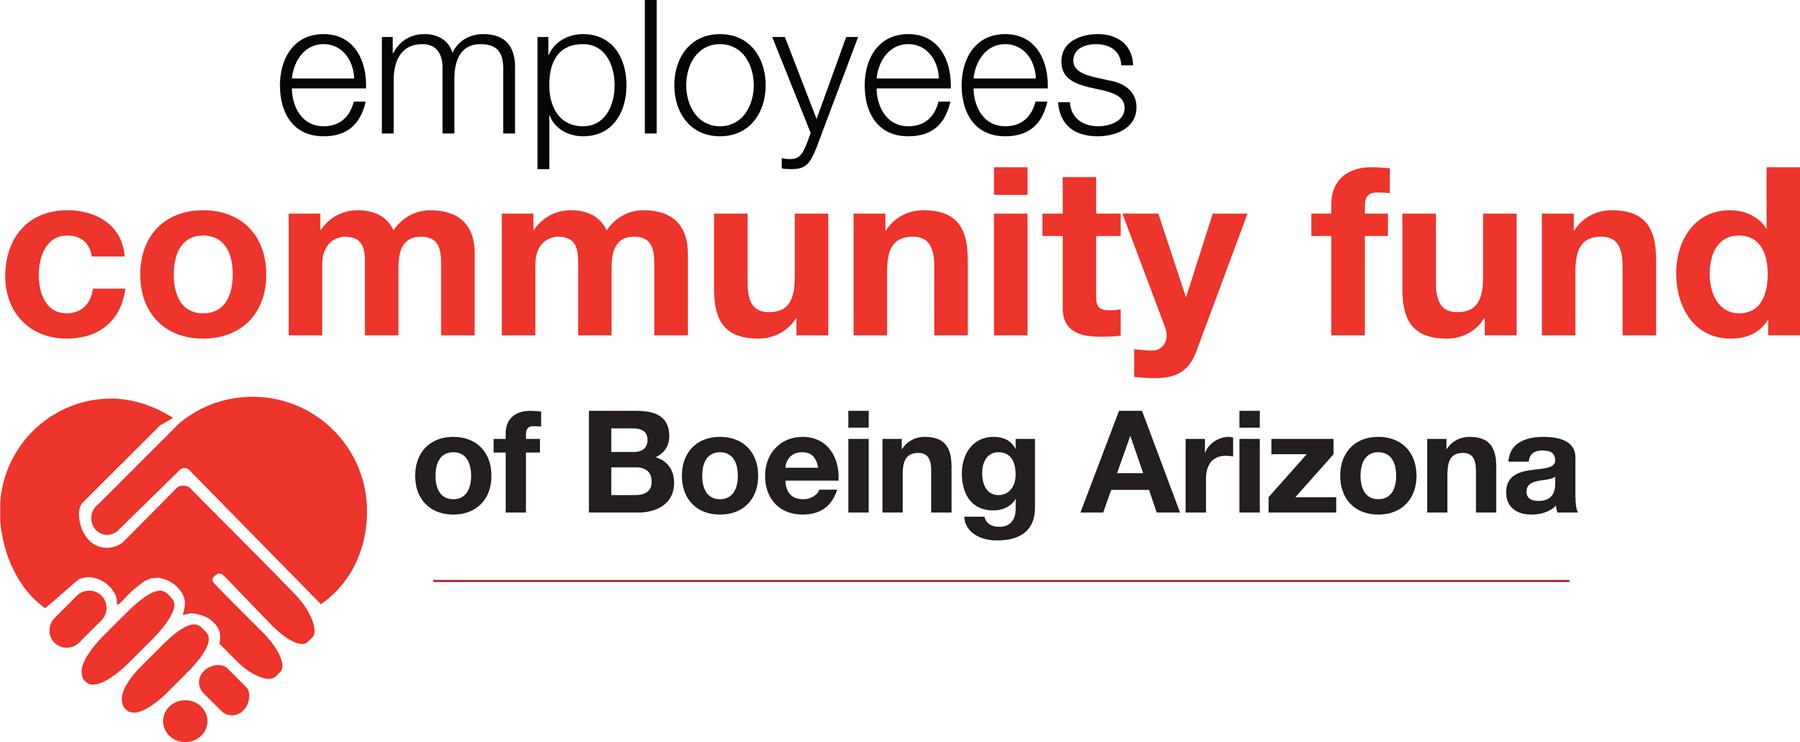 Employee Community Fund of Boeing Mesa